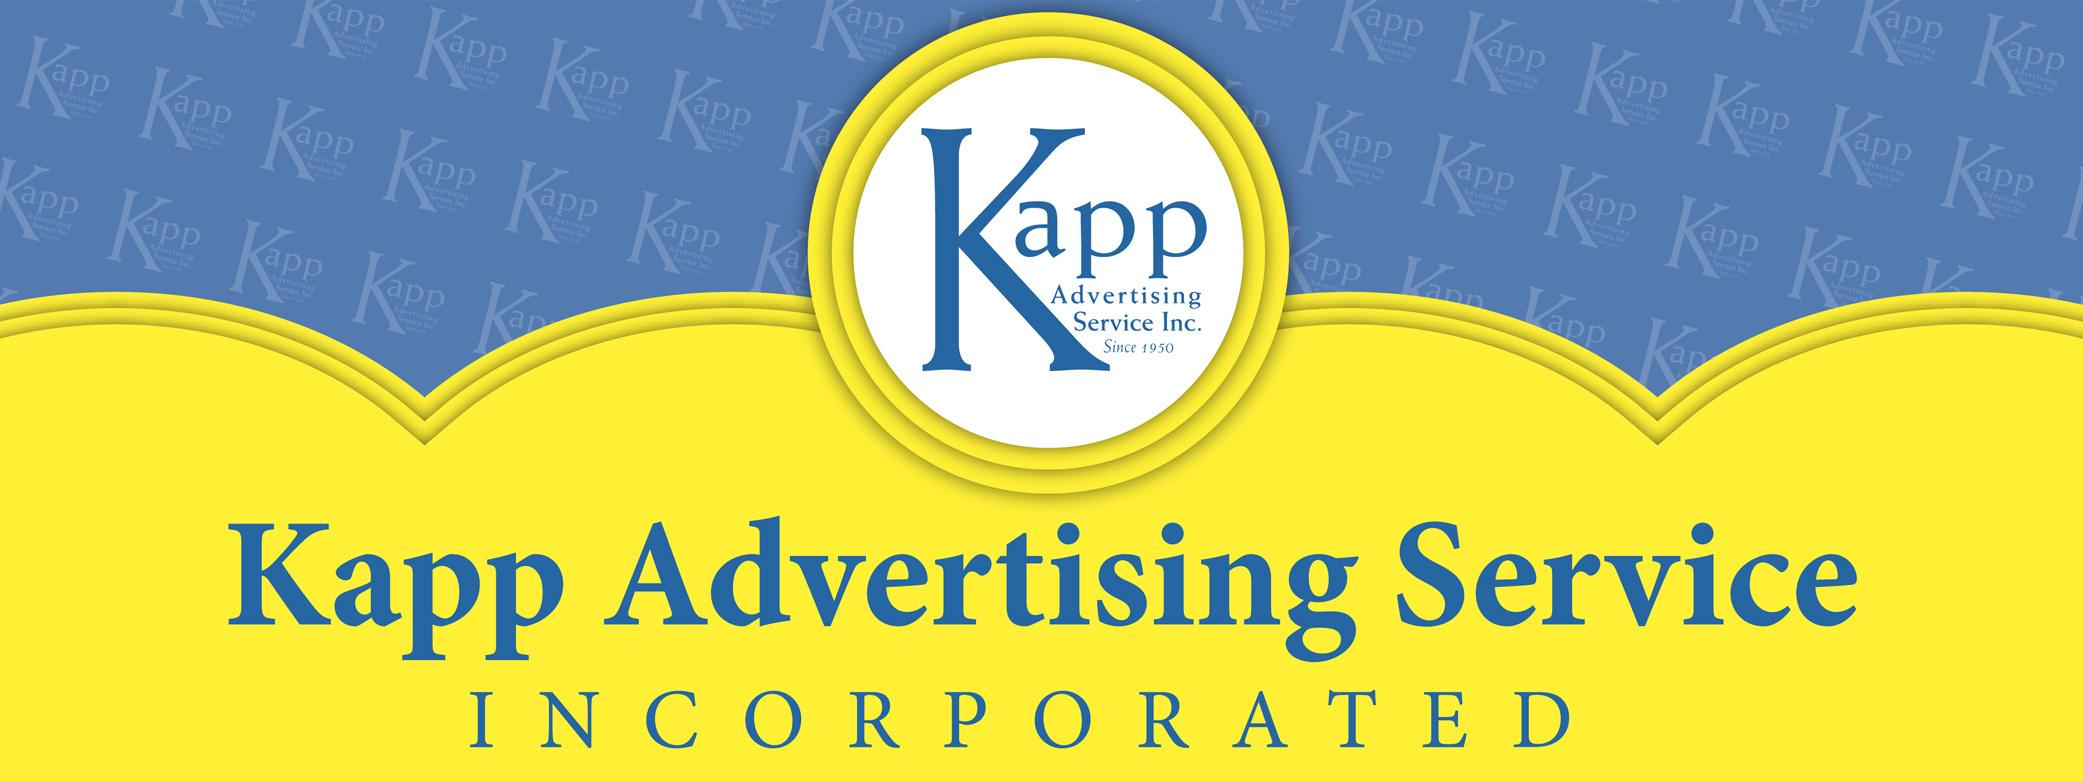 KappAdvertising.jpg